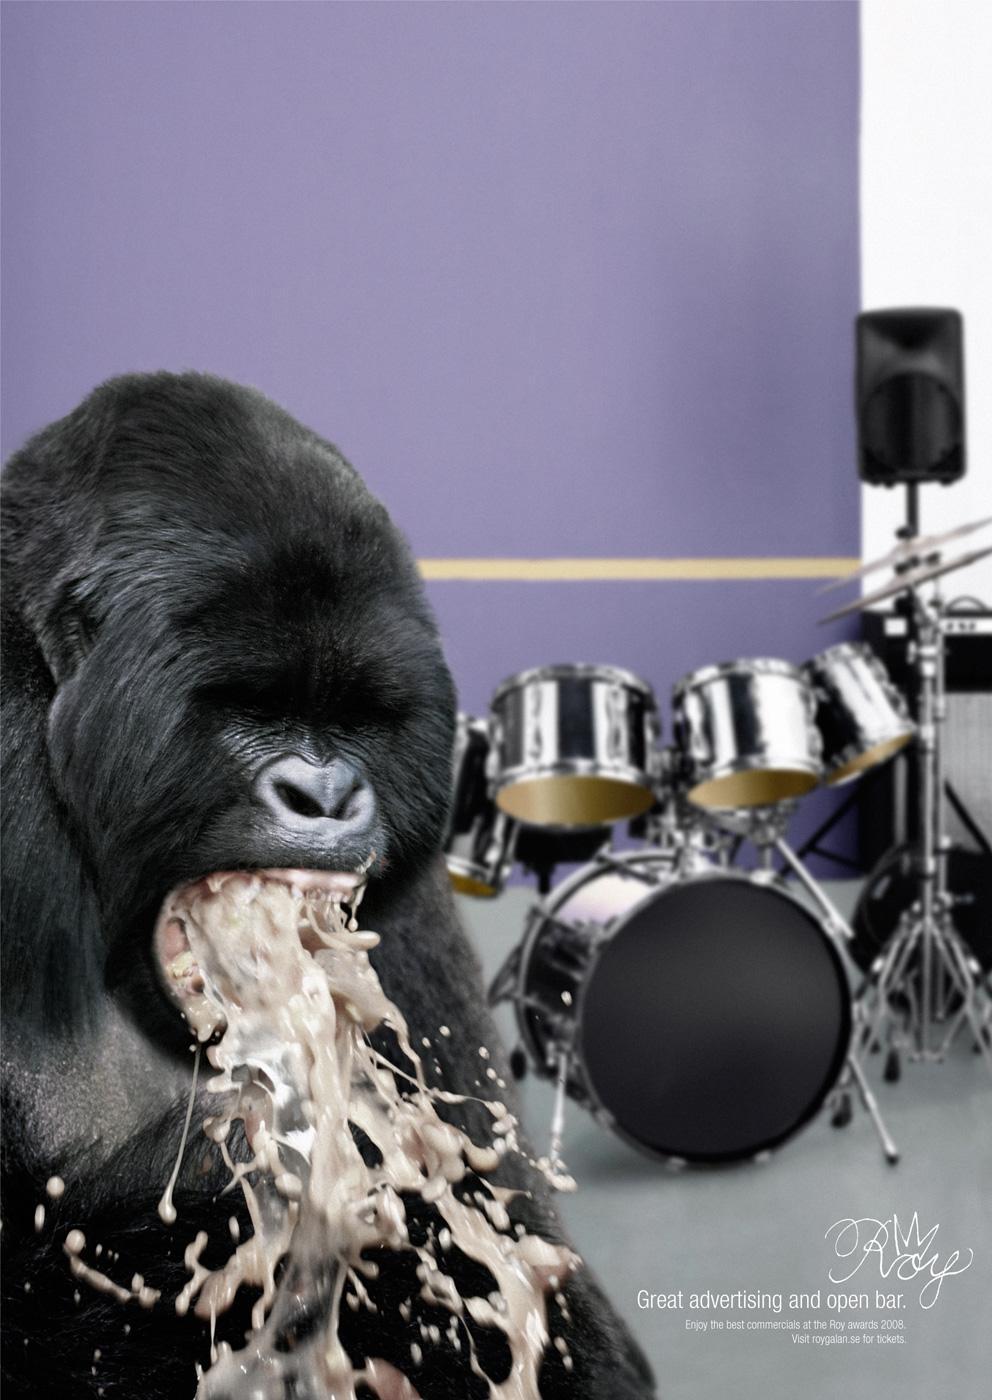 Roy Awards Print Ad -  Gorilla